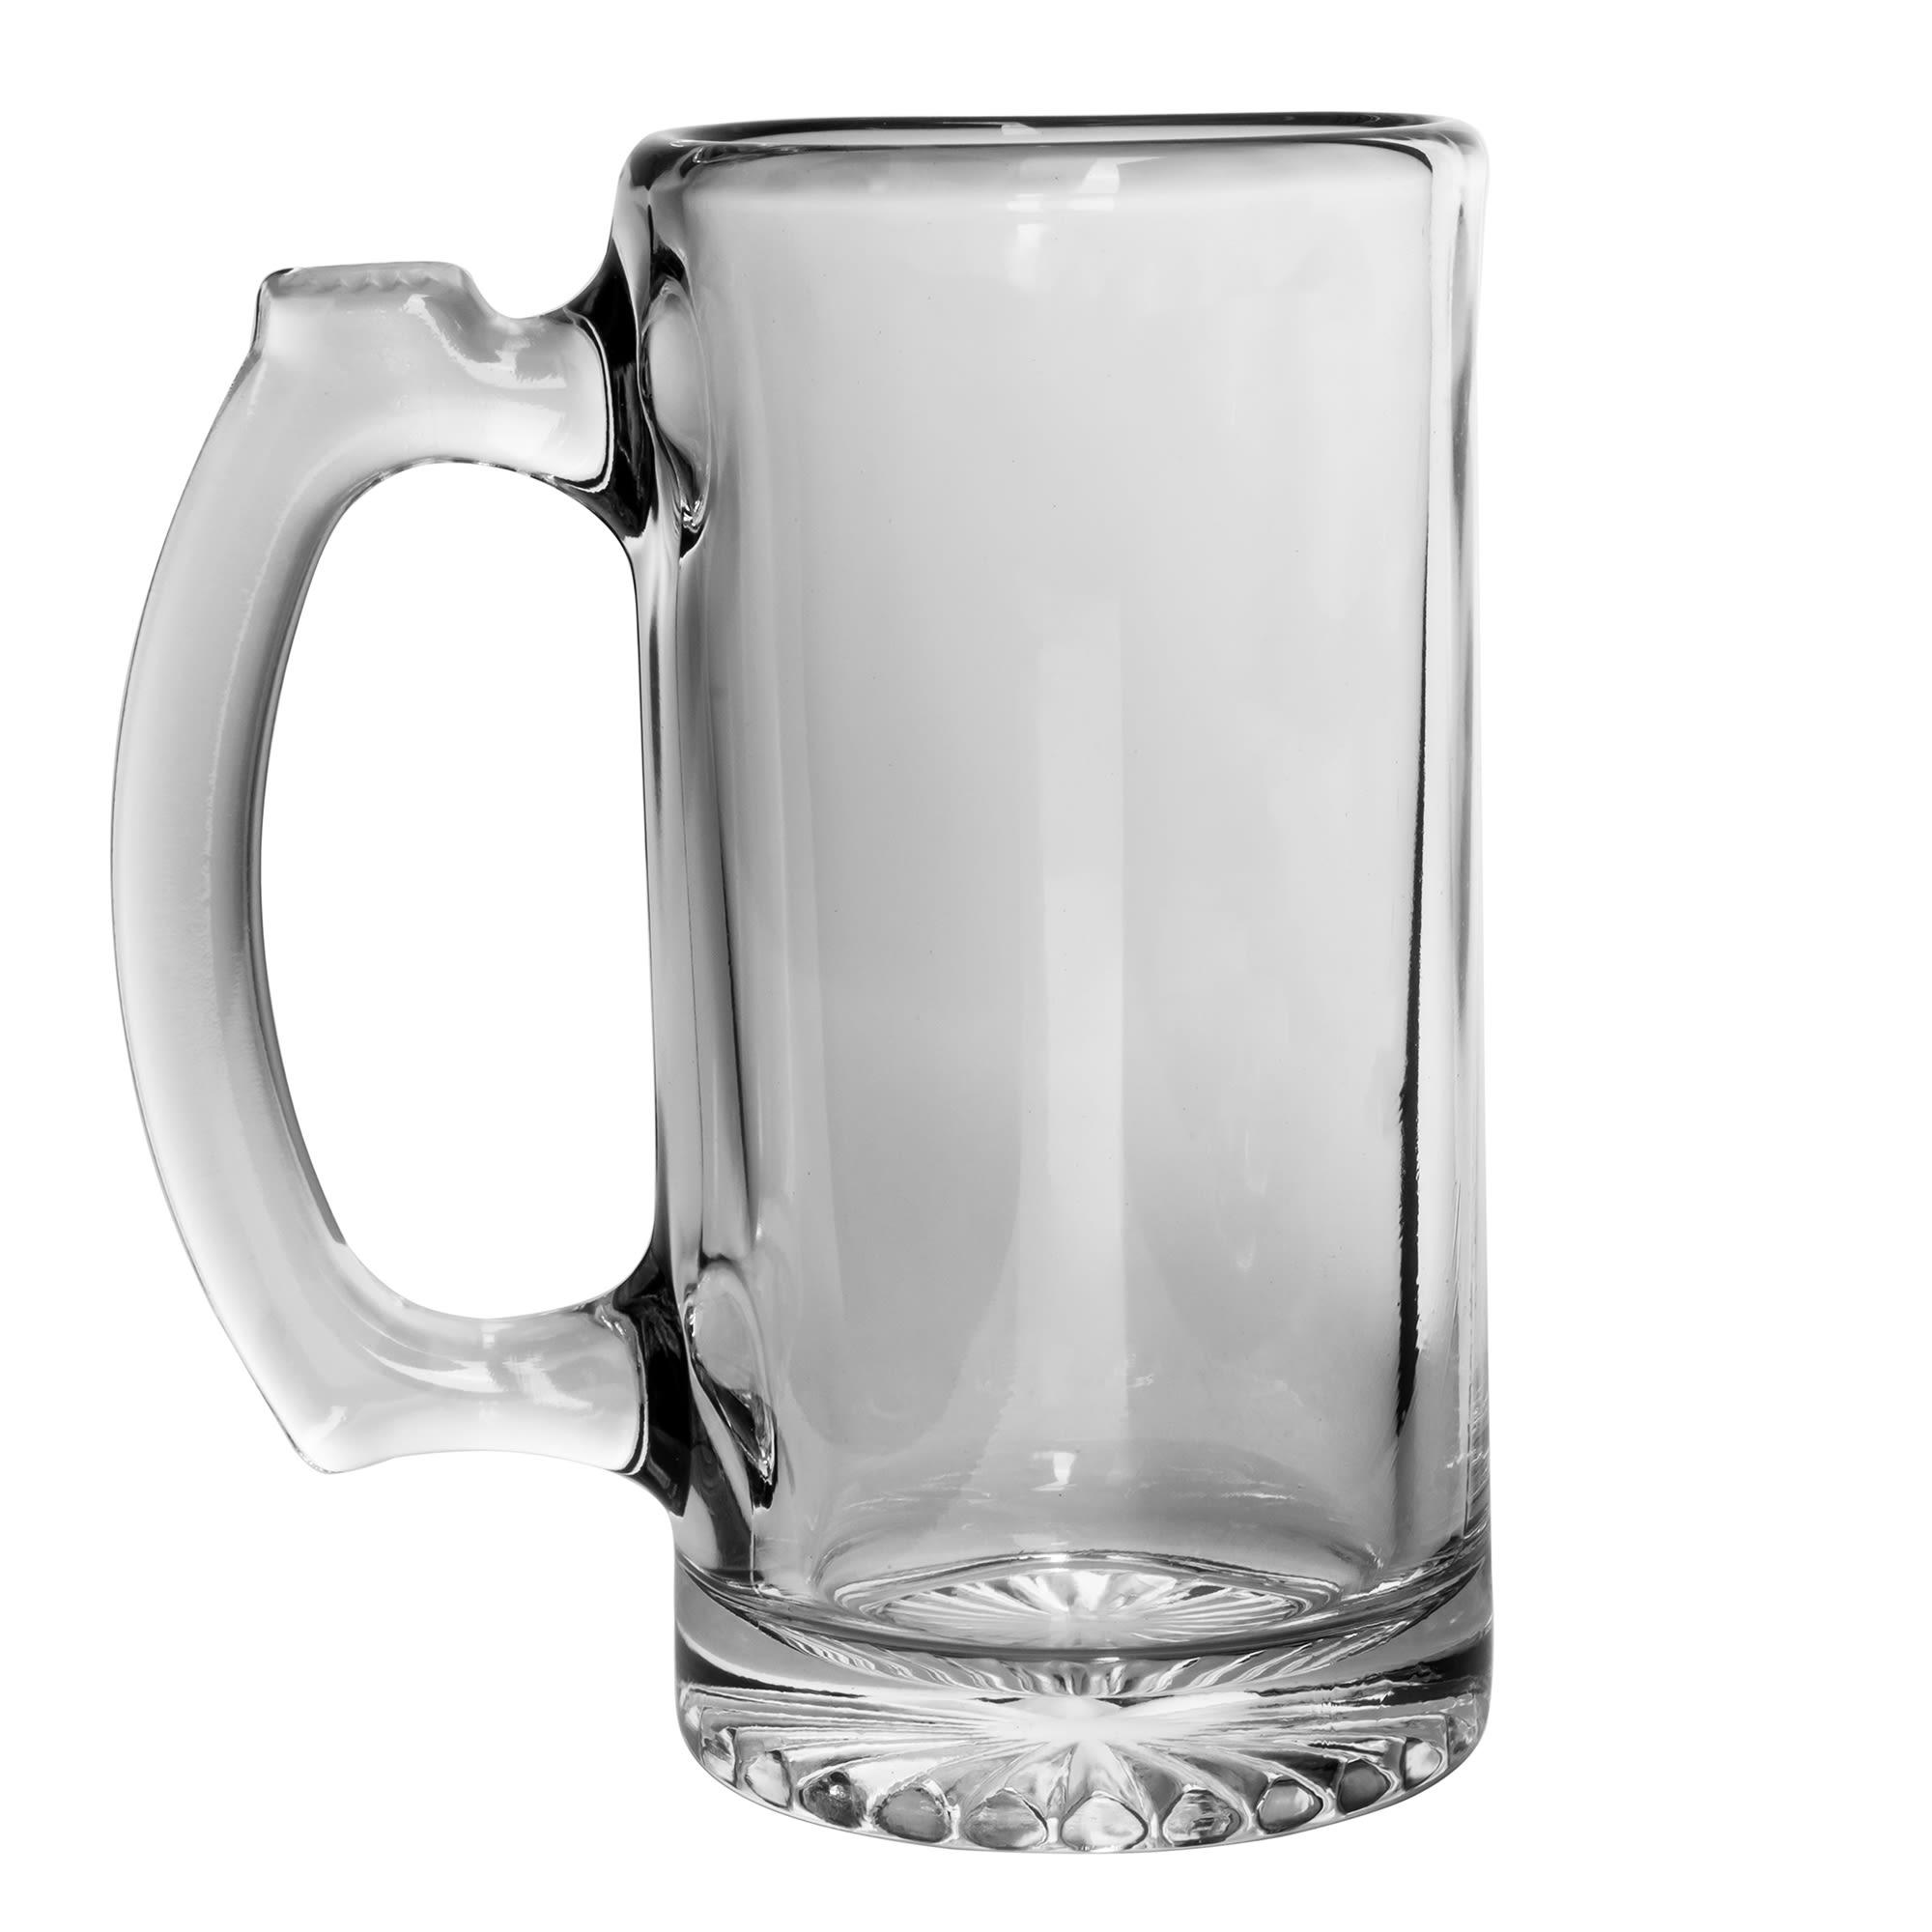 Libbey 5273 12-oz Handled Mug